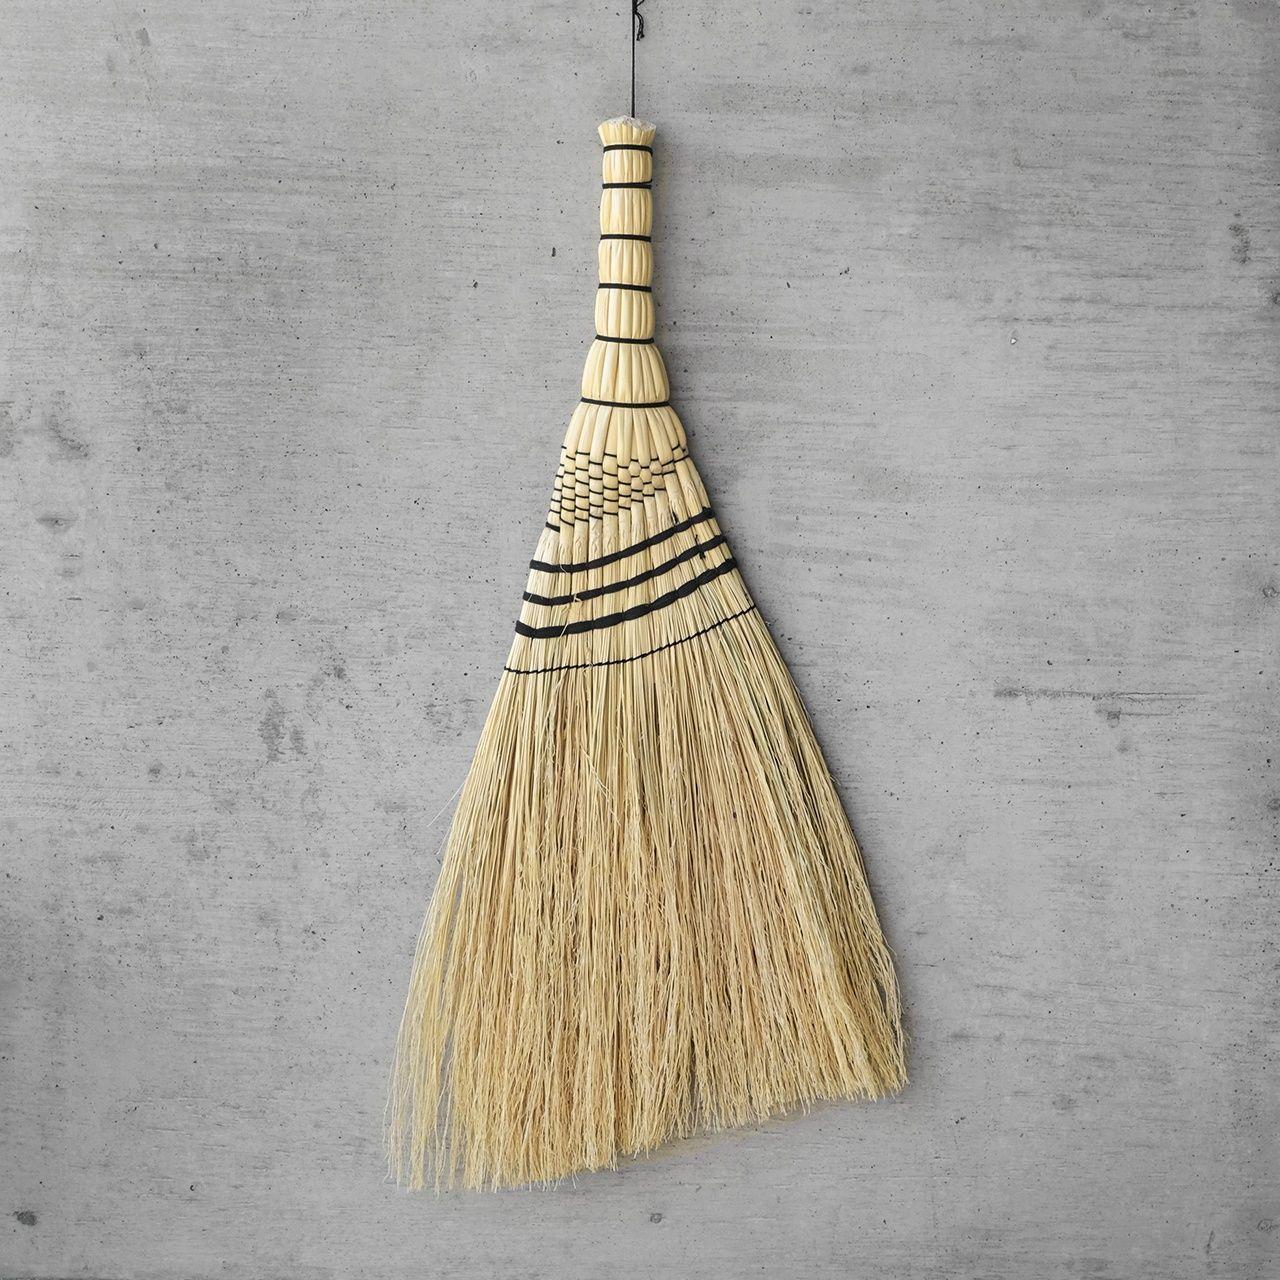 matsunoya grass broom analogue life ønskeliste sunniva